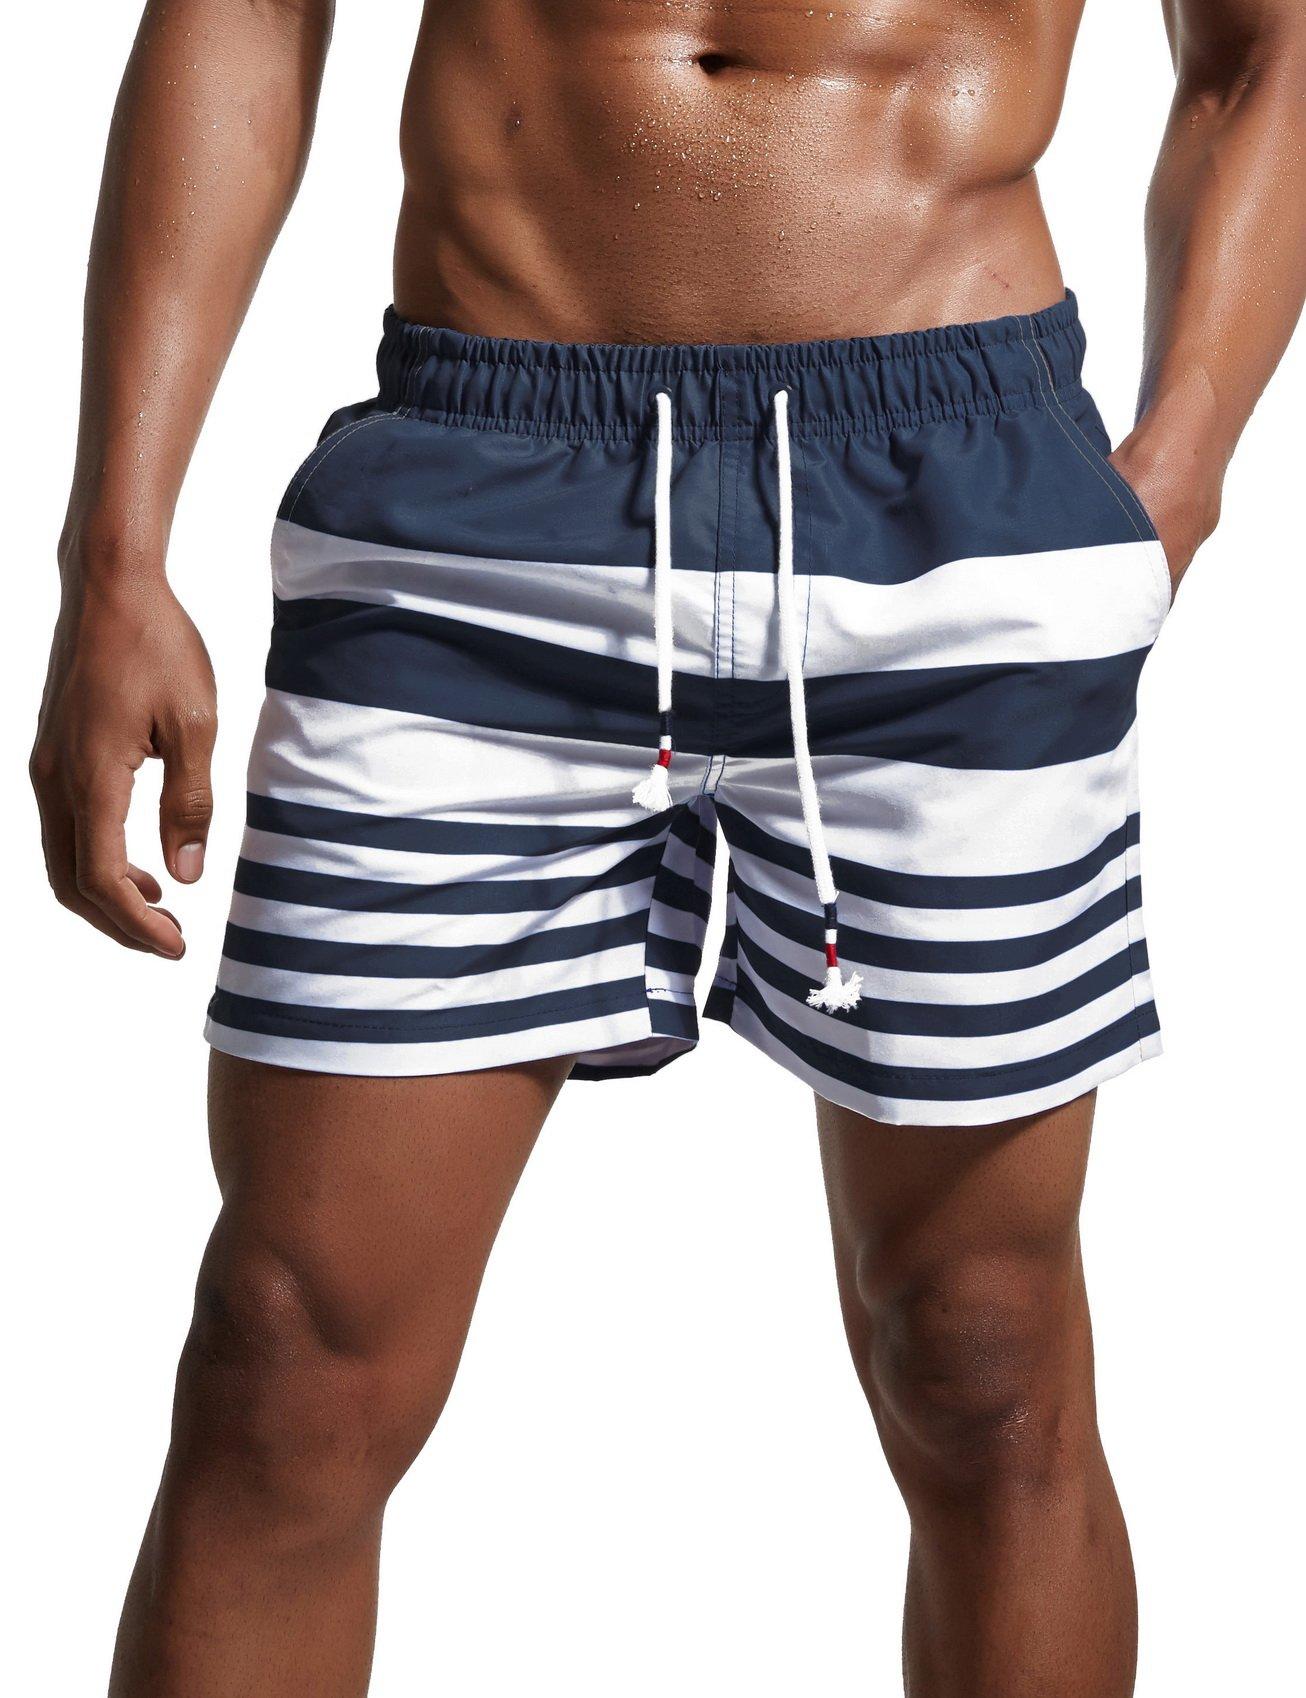 ChinFun Men's Swimsuit Swim Trunks Water Shorts Swimwear Drawstring Stripes Board Shorts Bathing Suits Mesh Lining Brief Side Pockets Navy Size XXXL